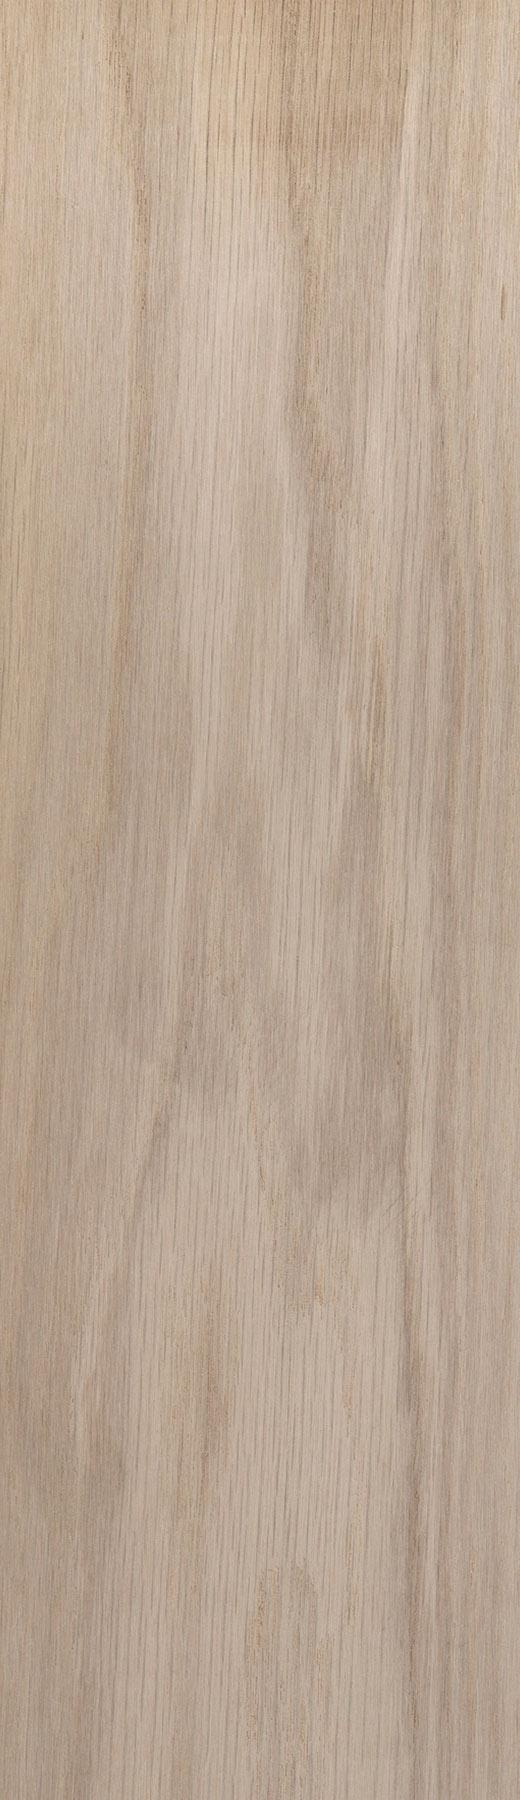 maderas-terramont-vitare-white-oak-acabado en obra